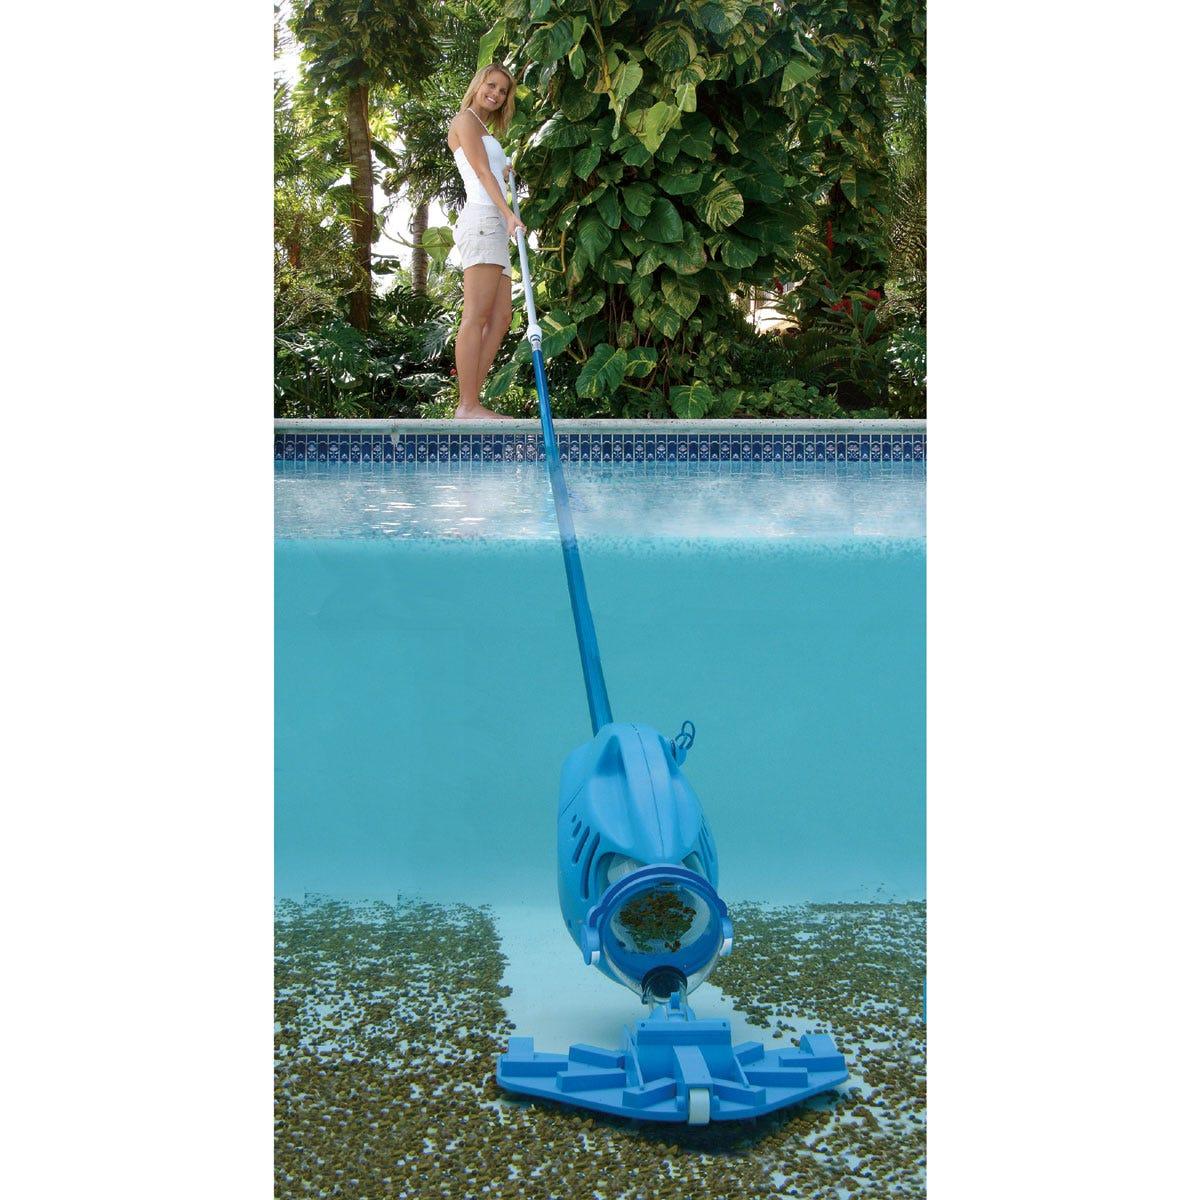 Pool Blaster Hoseless Vacuum Cleaner From Sporty S Pilot